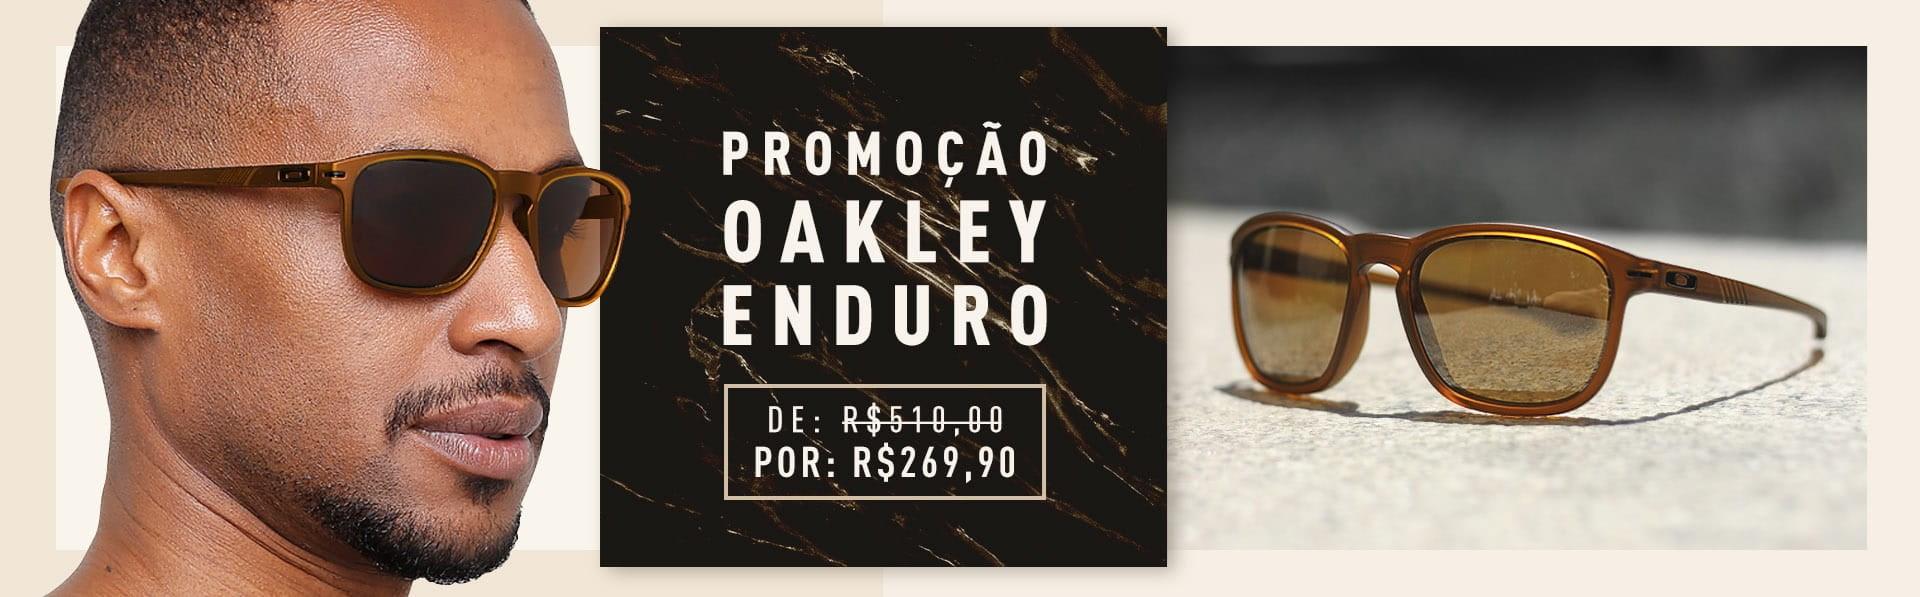 Oakley Enduro promo